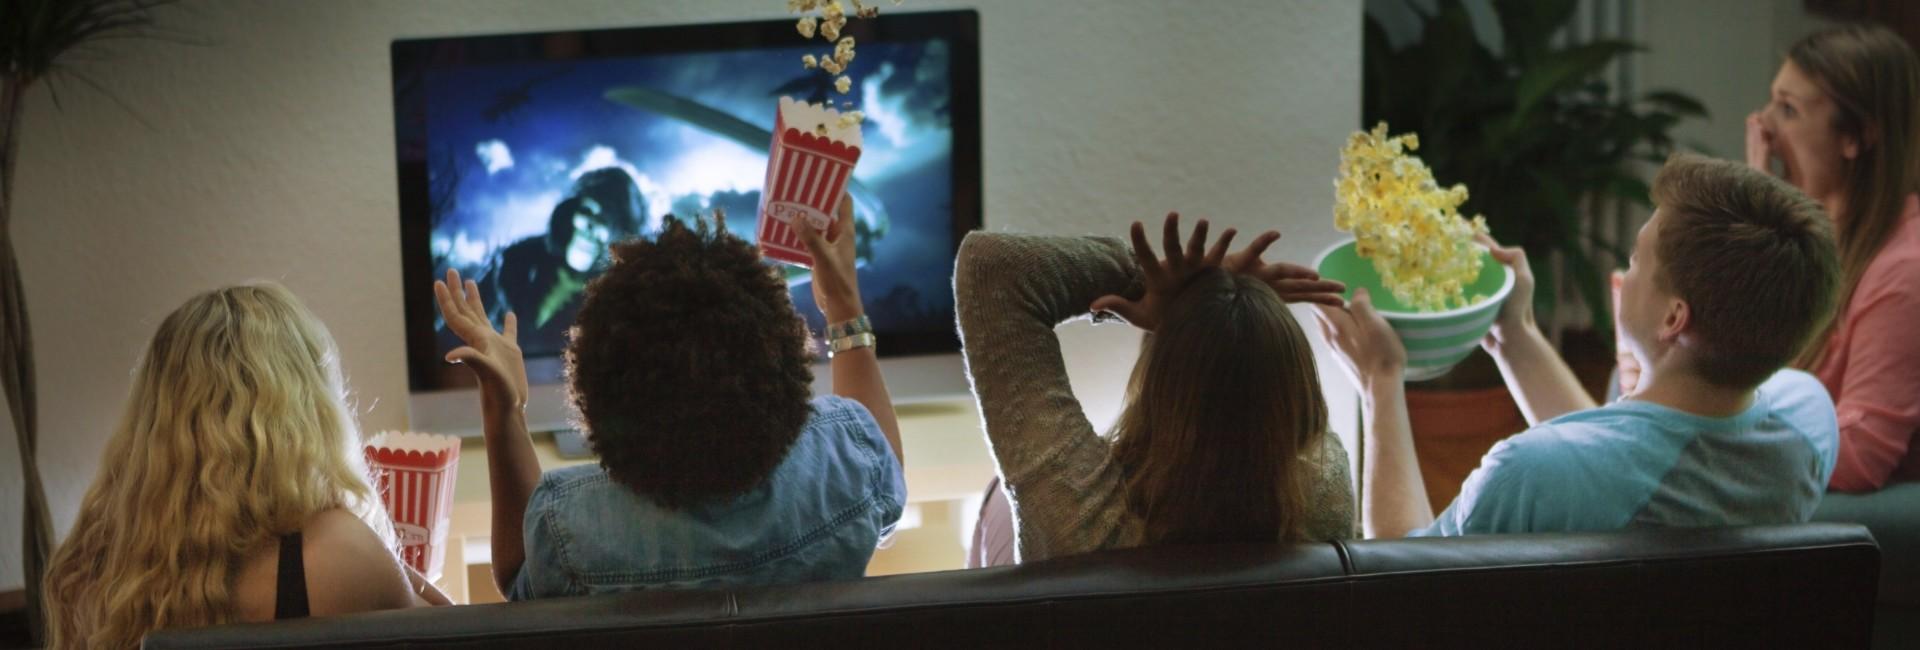 OTT video streaming platform solution for film distributors